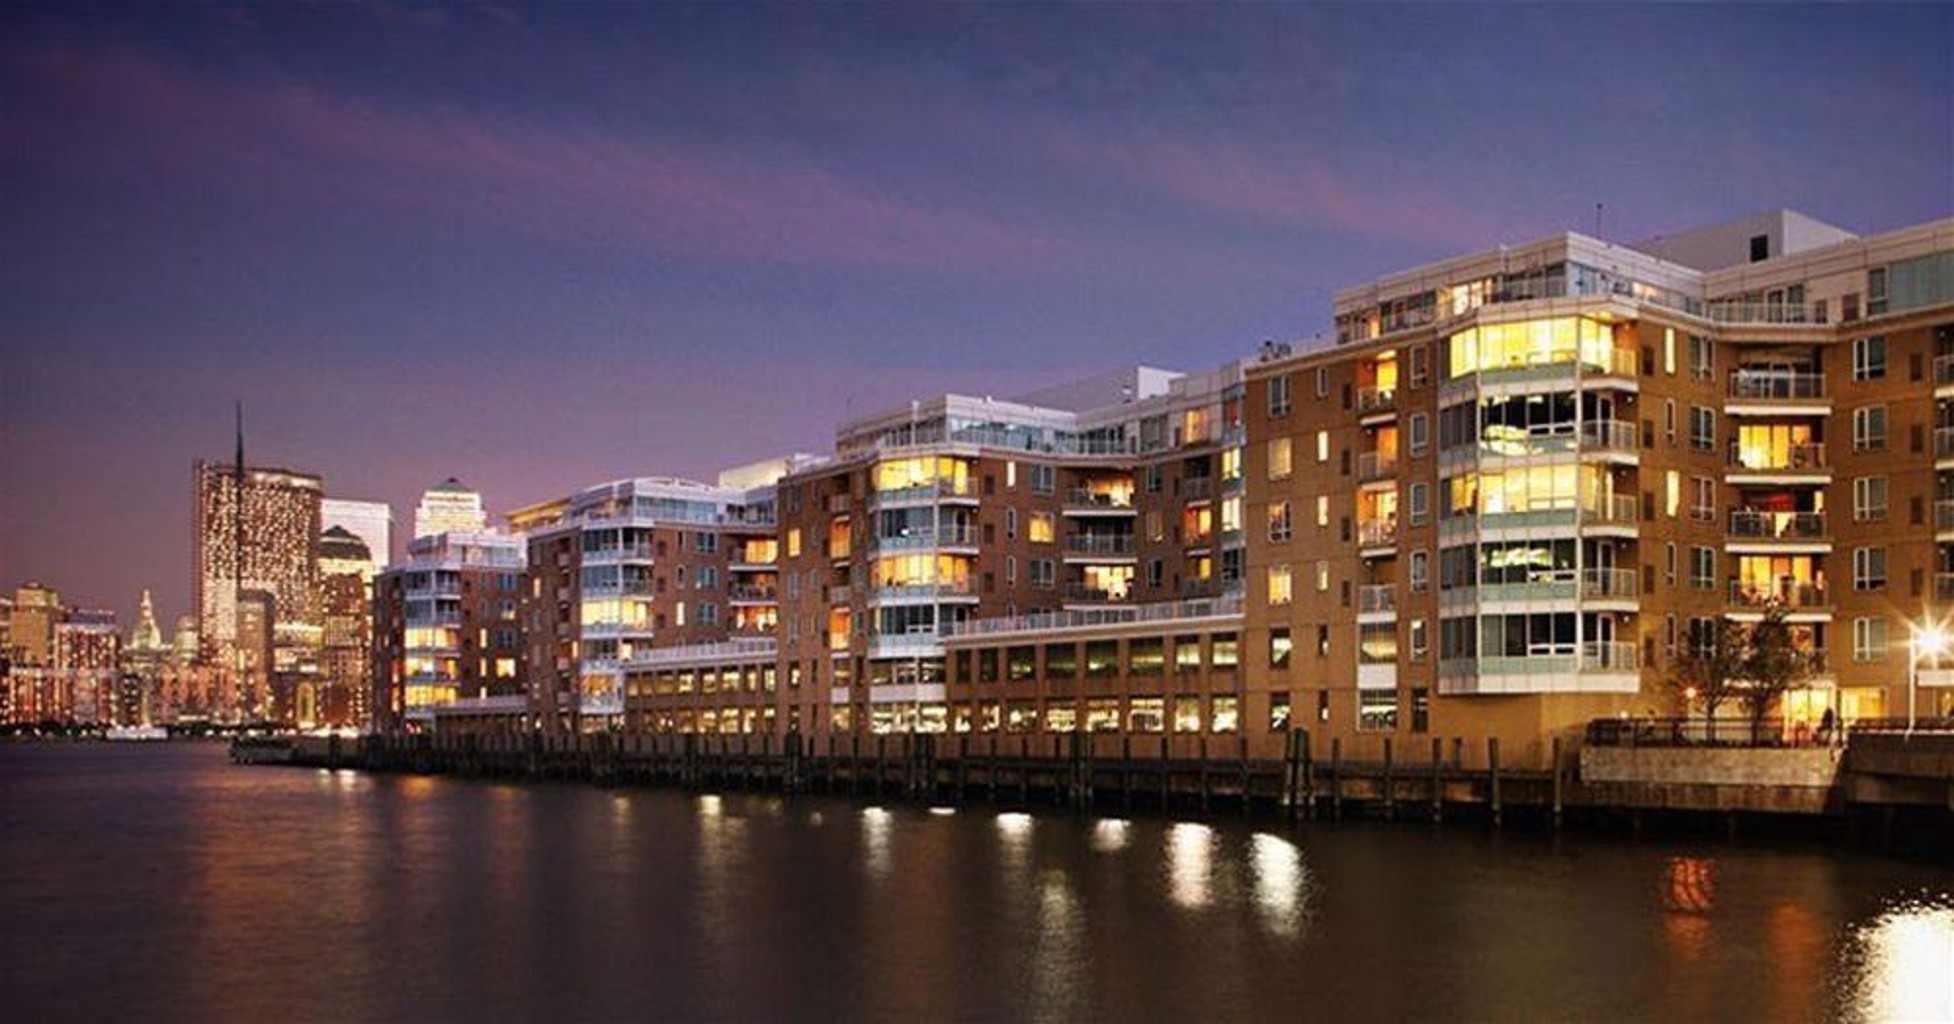 Luxy Suites Harborside